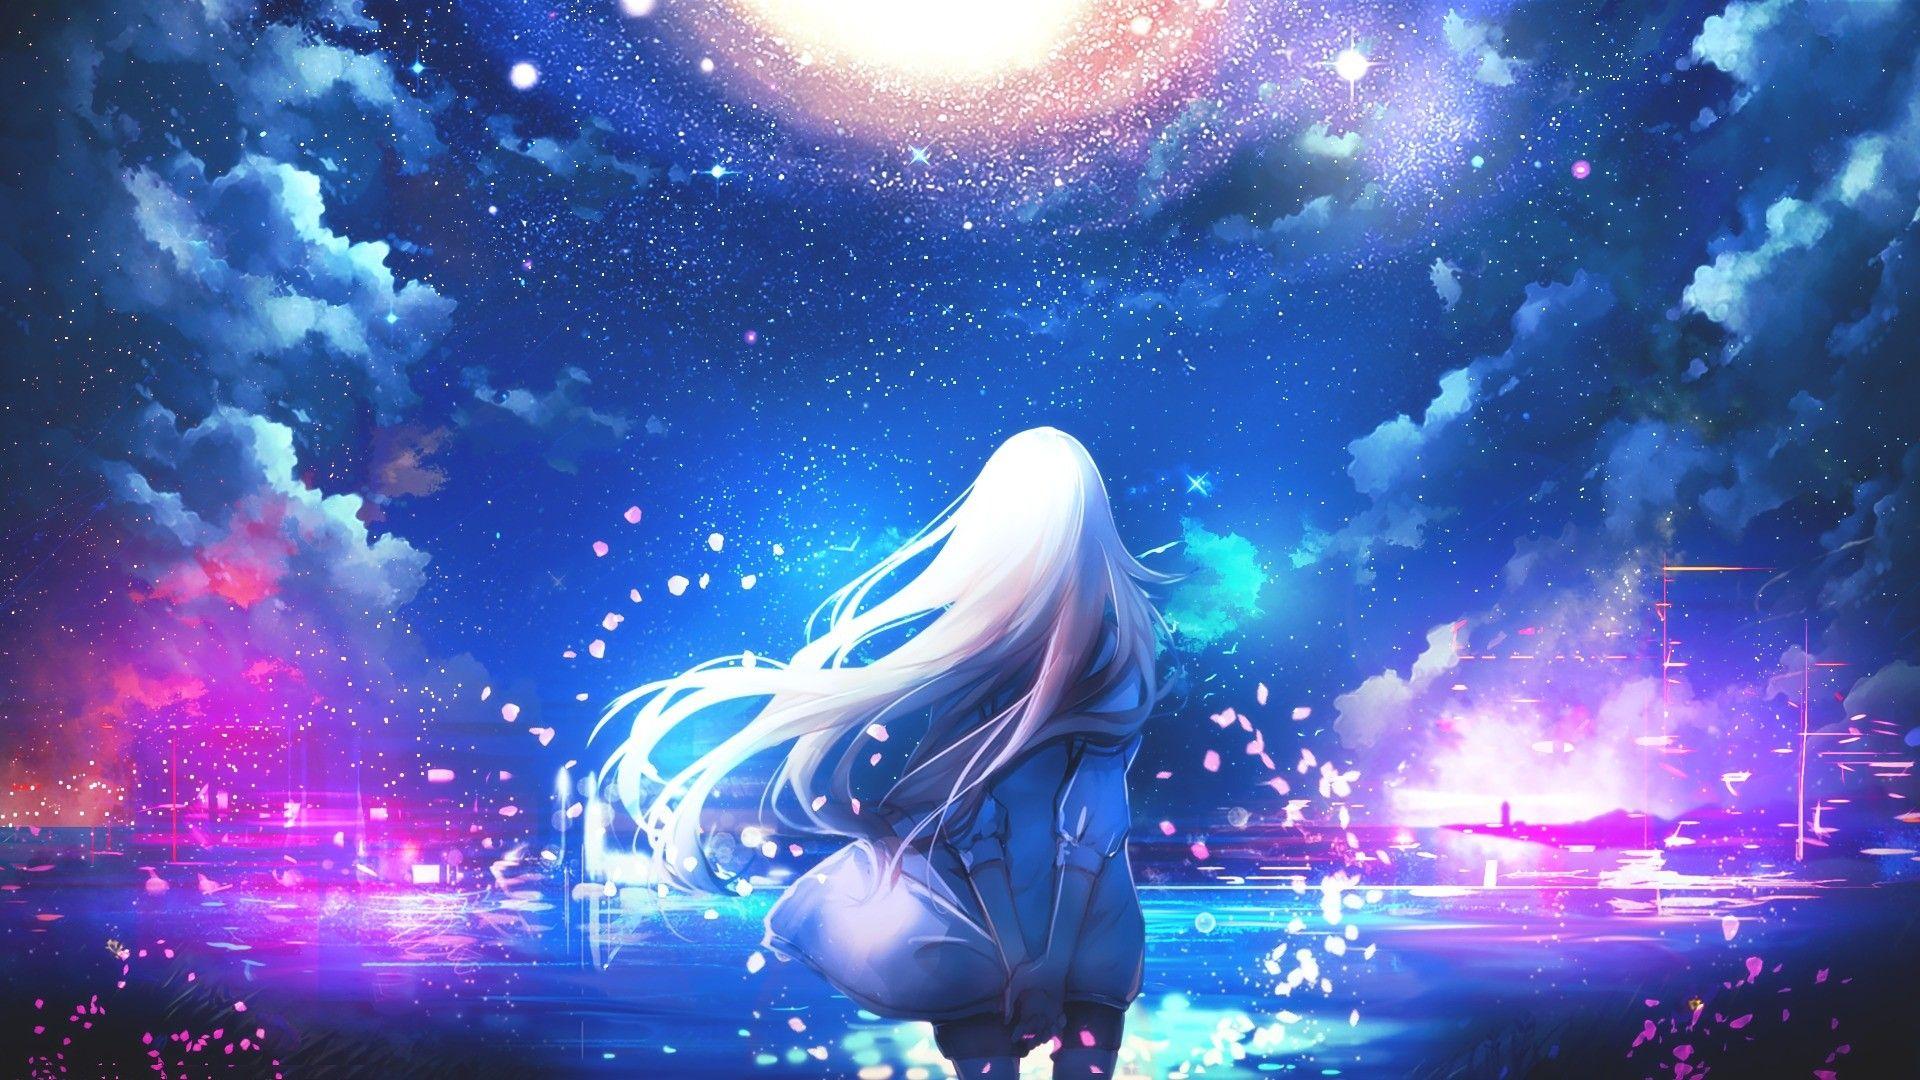 Anime, white hair, anime girls, night sky, stars, colorful